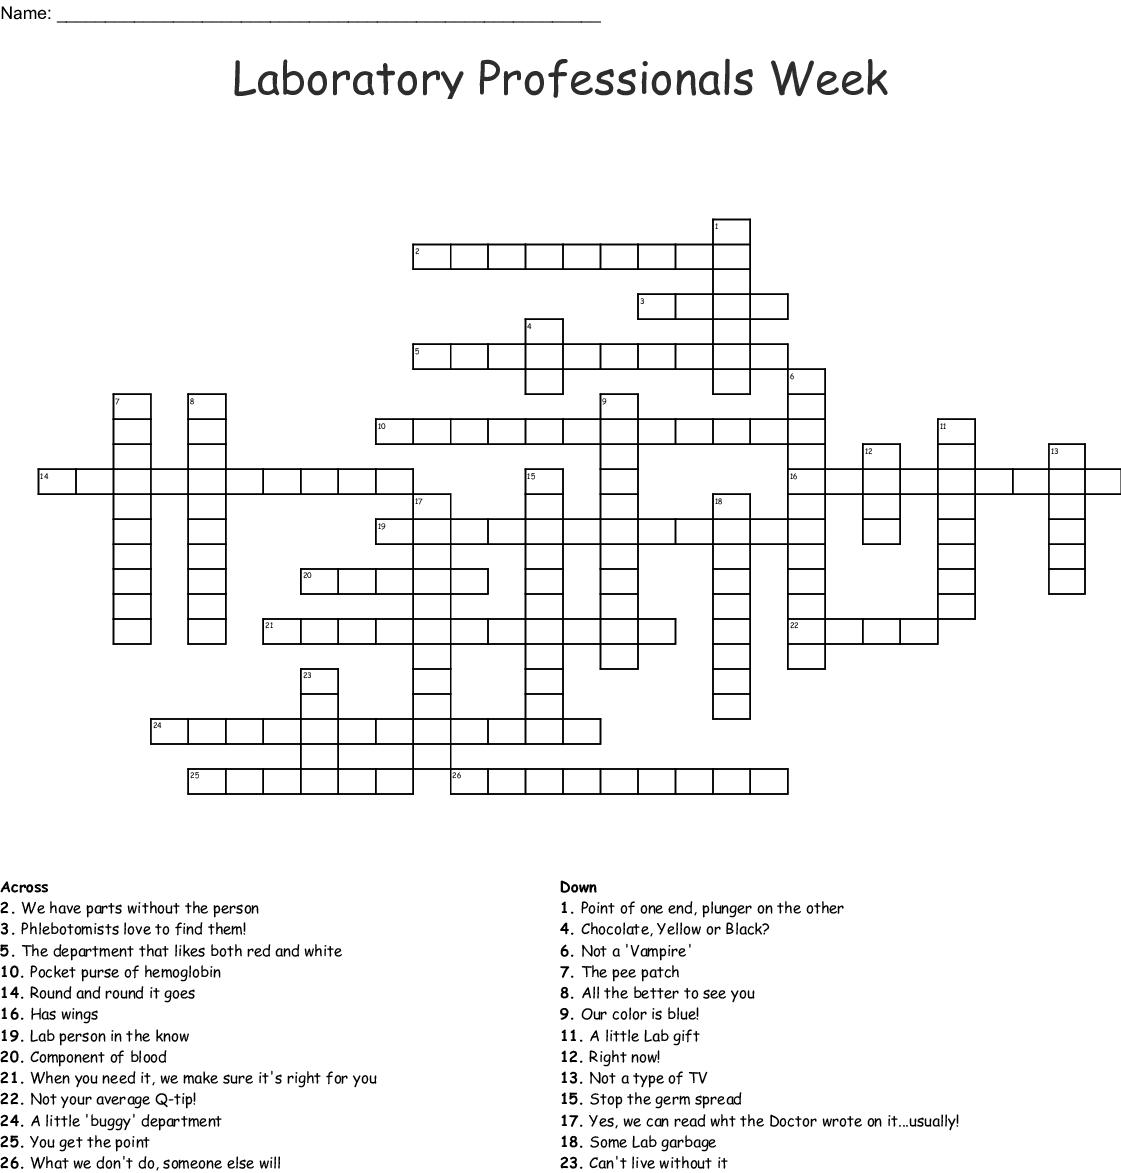 Laboratory Professionals Week Crossword